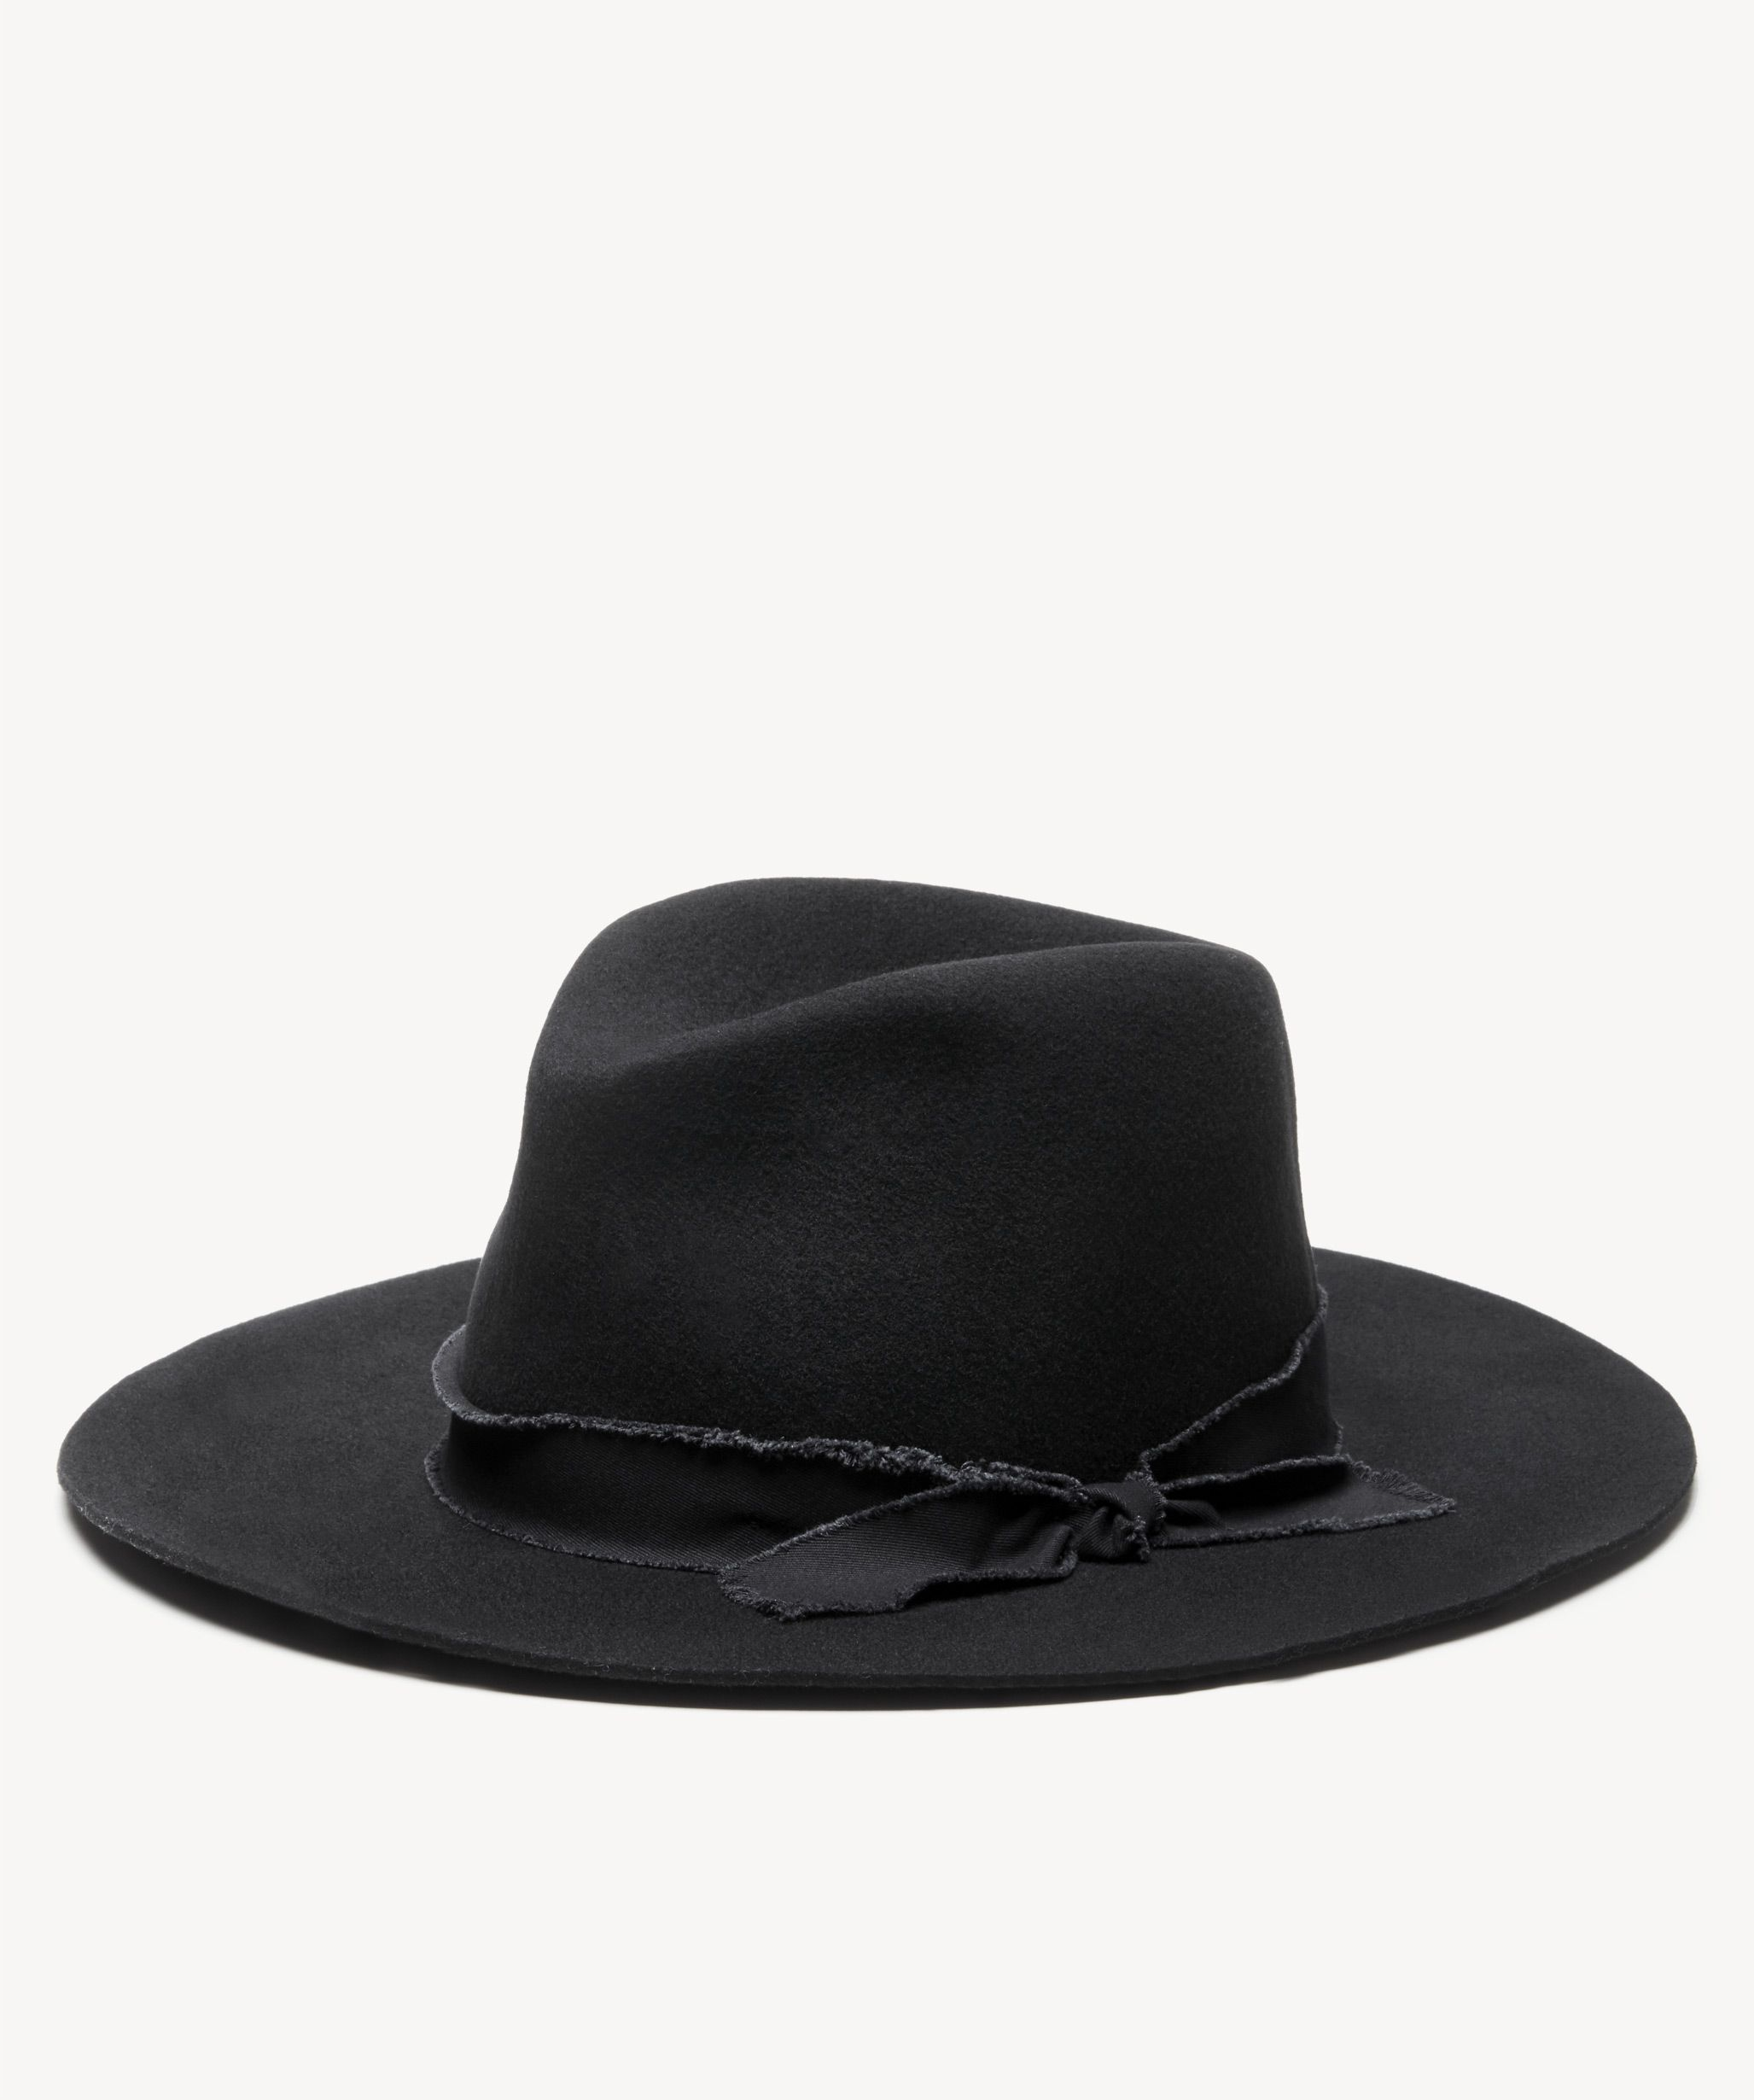 Women s Wool Felt Panama Hat Black  996a4e61959f